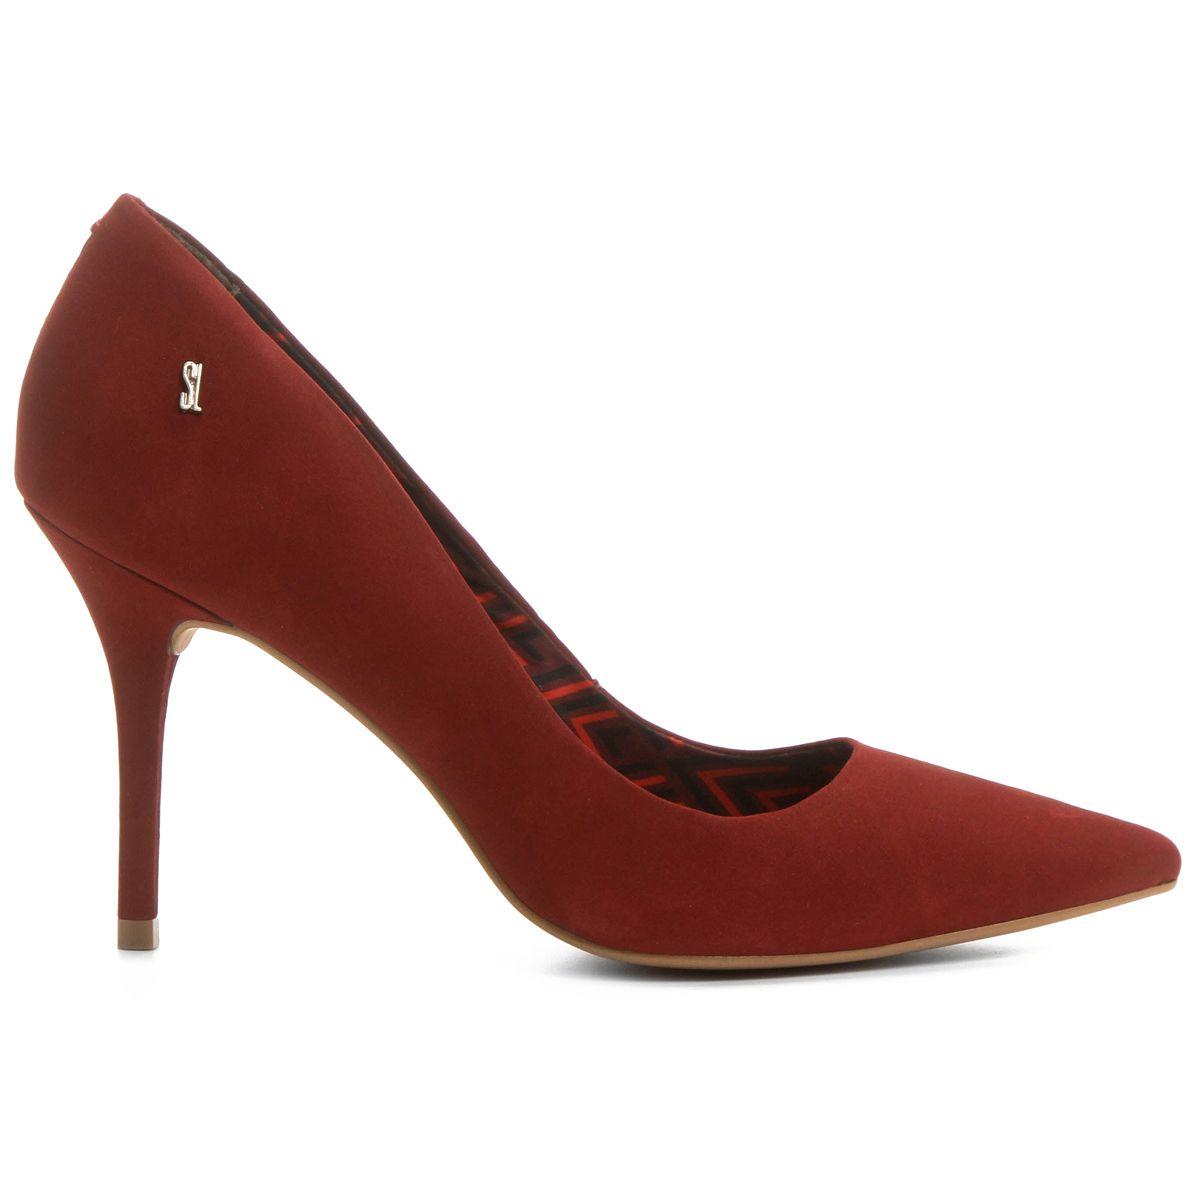 af04c5c948a44 Scarpin Santa Lolla Bico Fino Vinho | Zattini | Style | Shoes, Heels ...